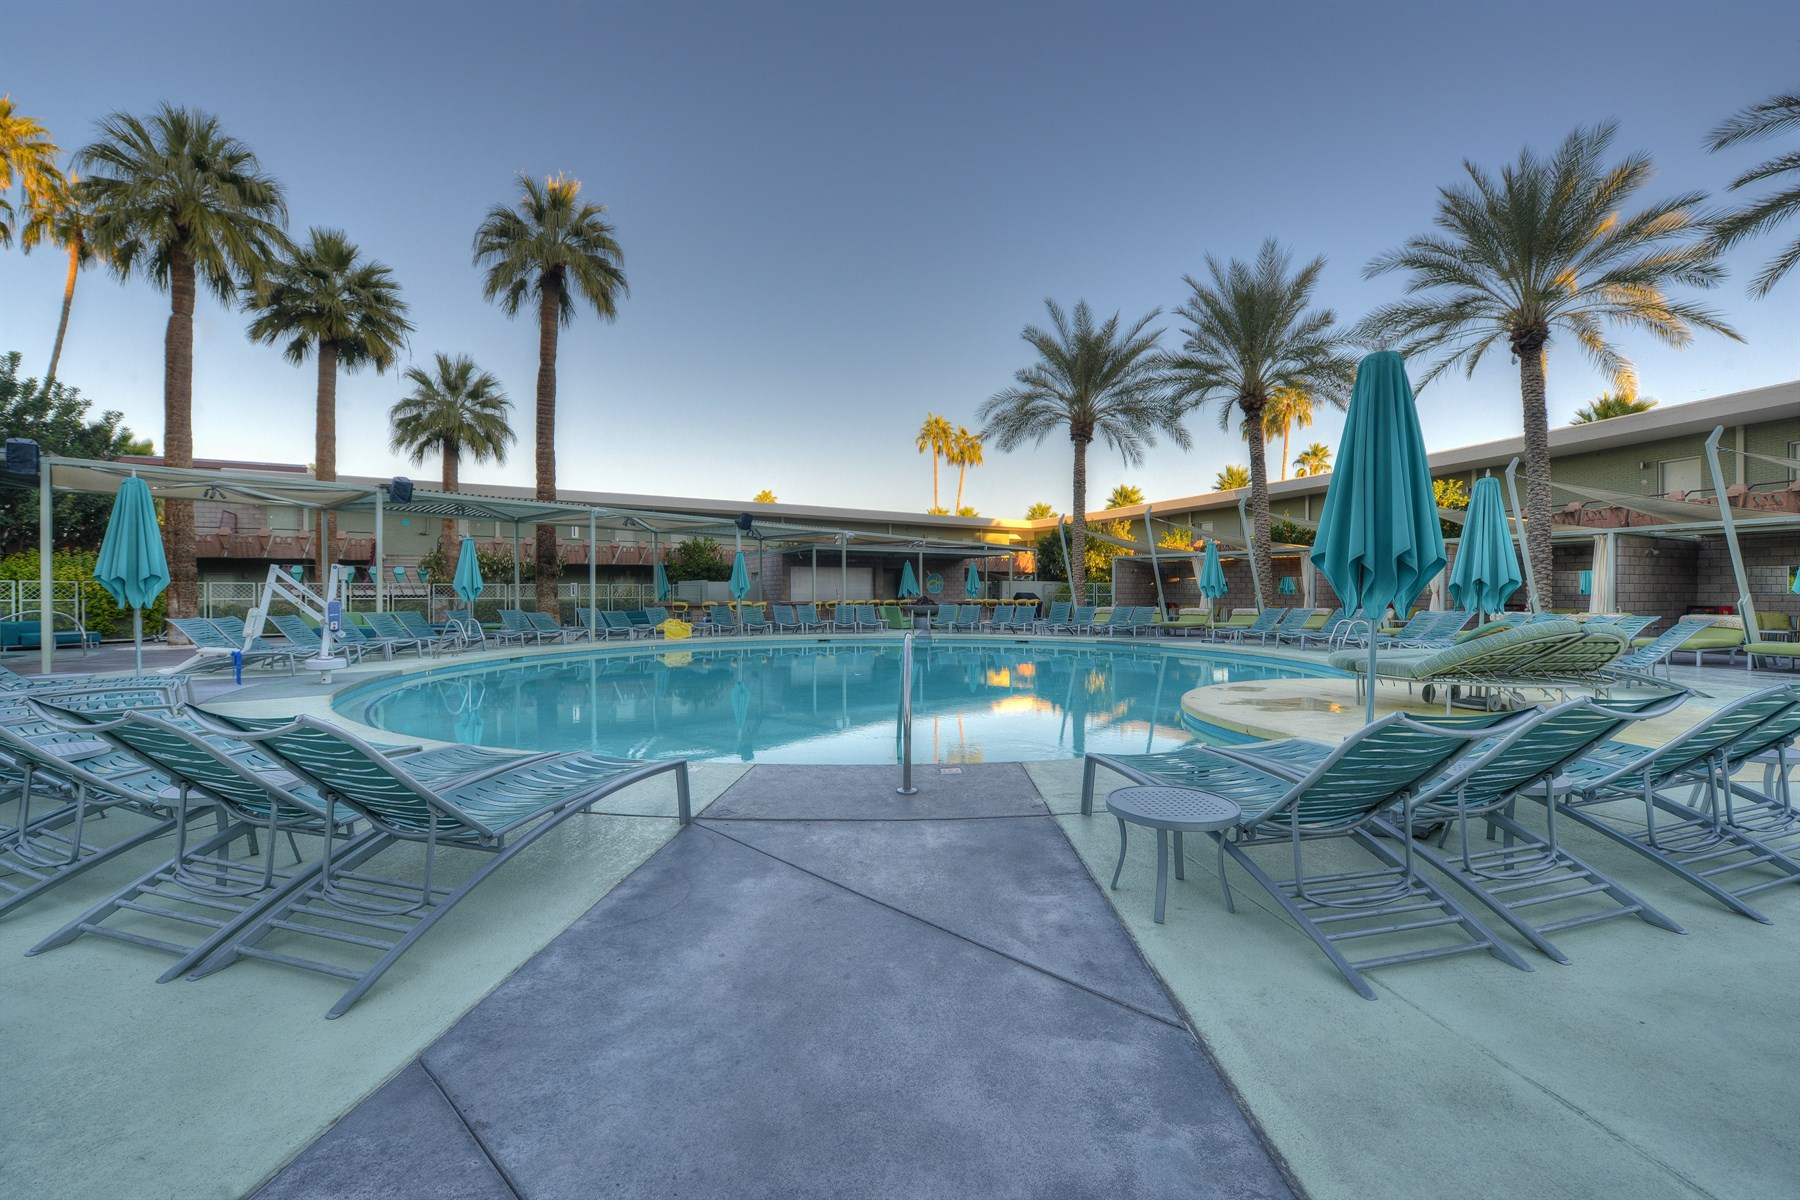 Condomínio para Venda às Private Luxury Residence At The Hotel Valley Ho 6850 E Main Street #7701 Scottsdale, Arizona 85251 Estados Unidos